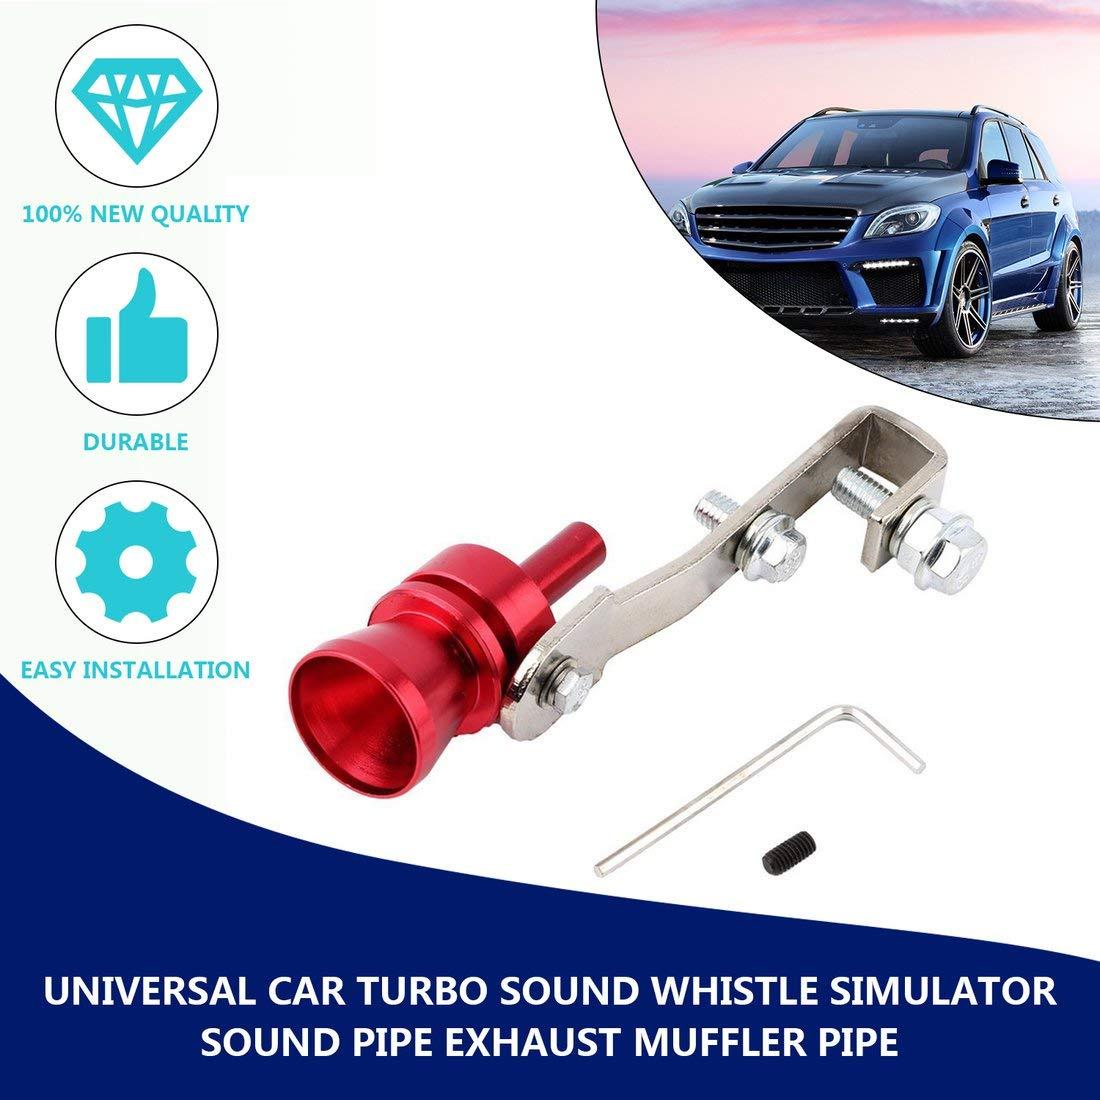 Universal Aluminium Cars Auto BOV Turbo Sound Silbato Tubo Simulador de Sonido Tubo de Escape Silenciador Tubo Tubo-Rojo